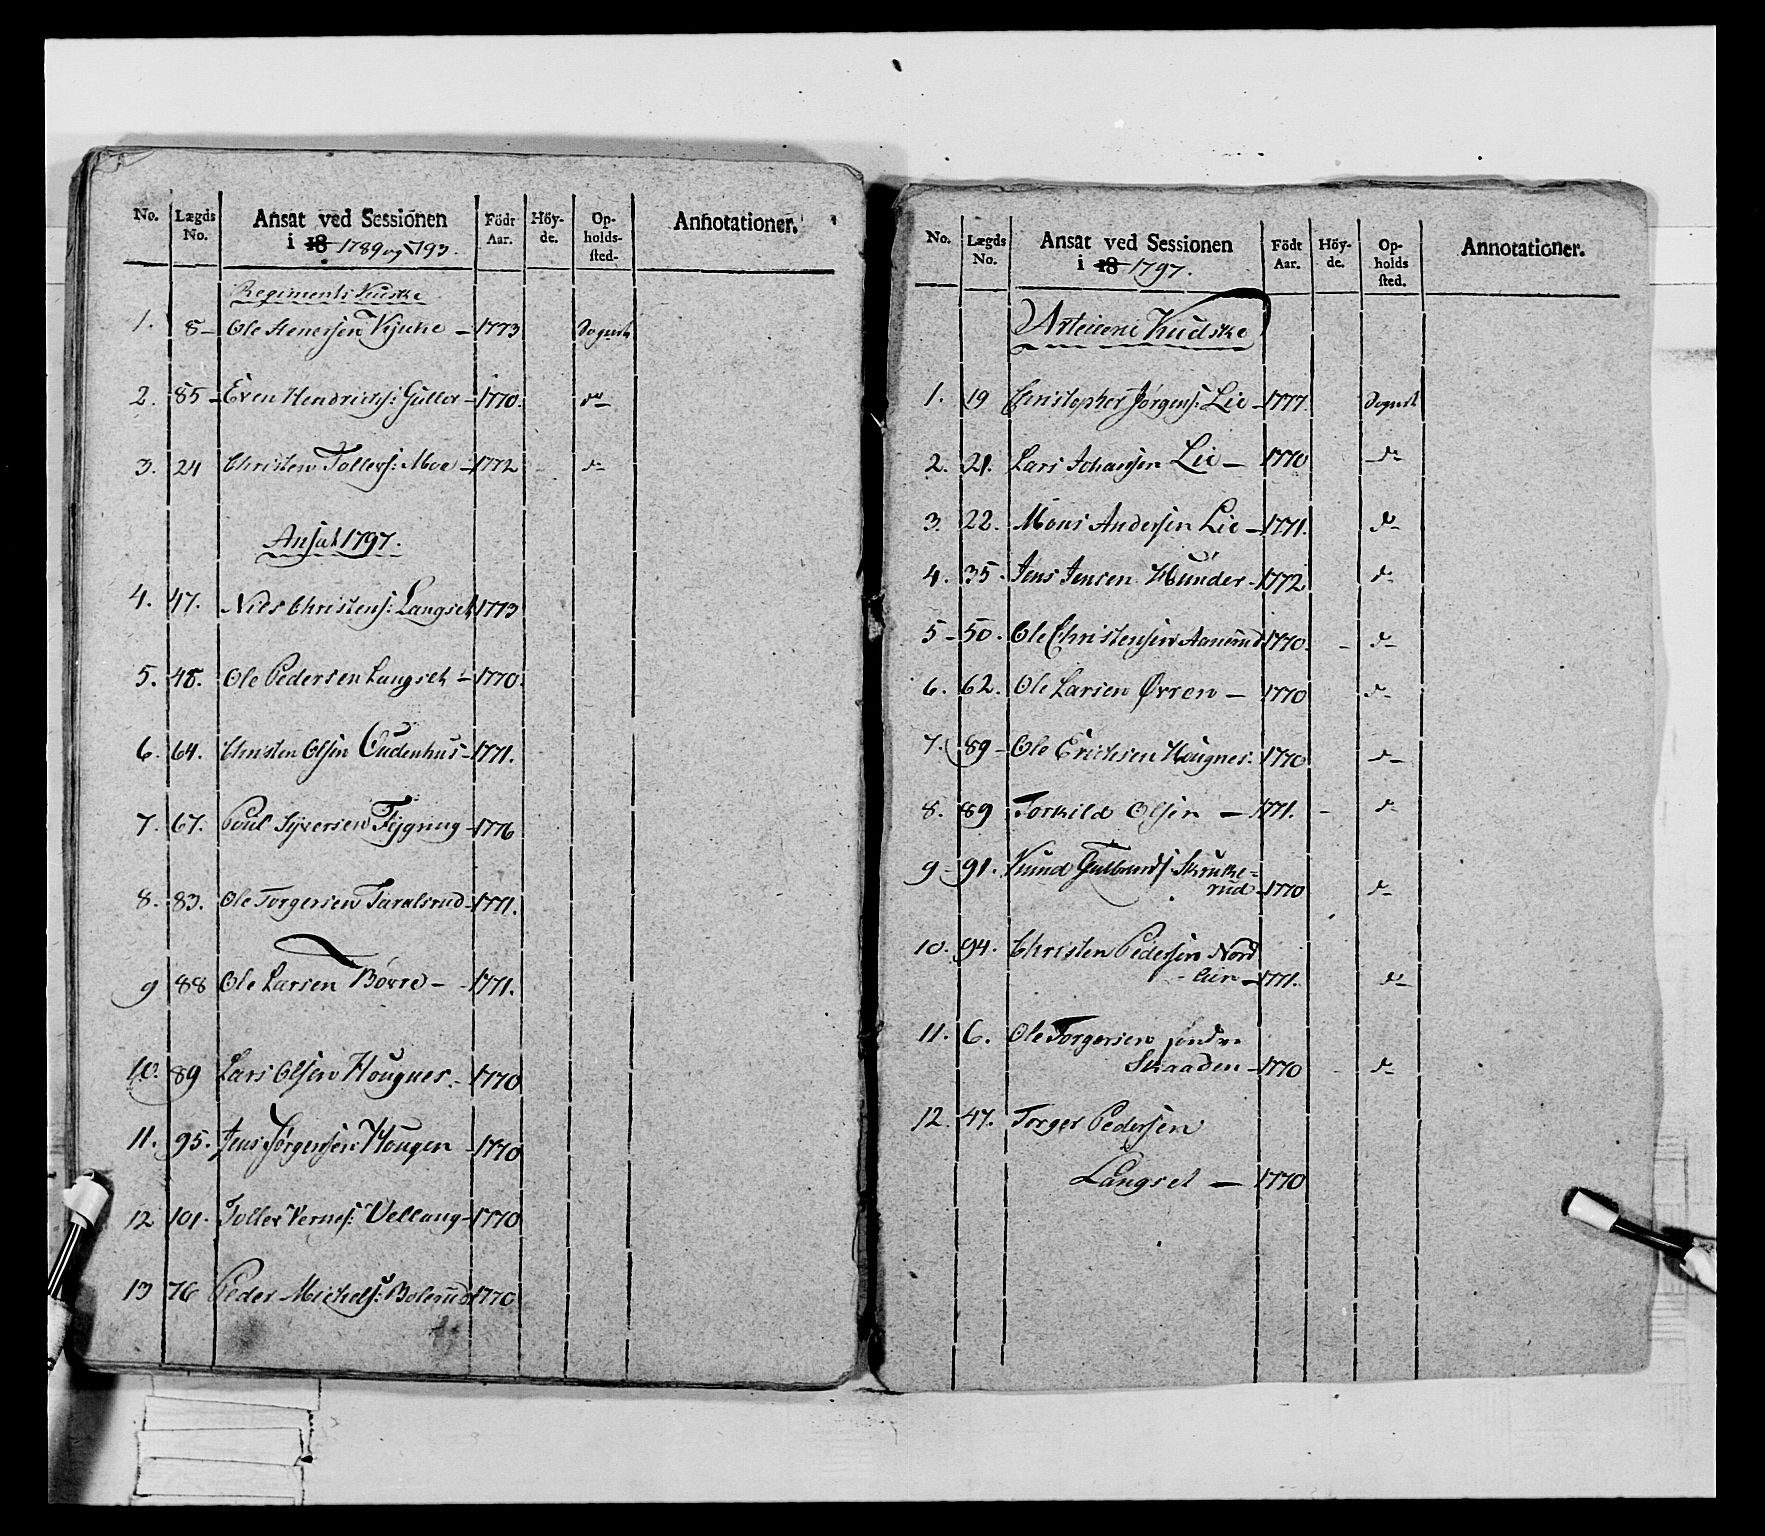 RA, Generalitets- og kommissariatskollegiet, Det kongelige norske kommissariatskollegium, E/Eh/L0069: Opplandske gevorbne infanteriregiment, 1810-1818, s. 104